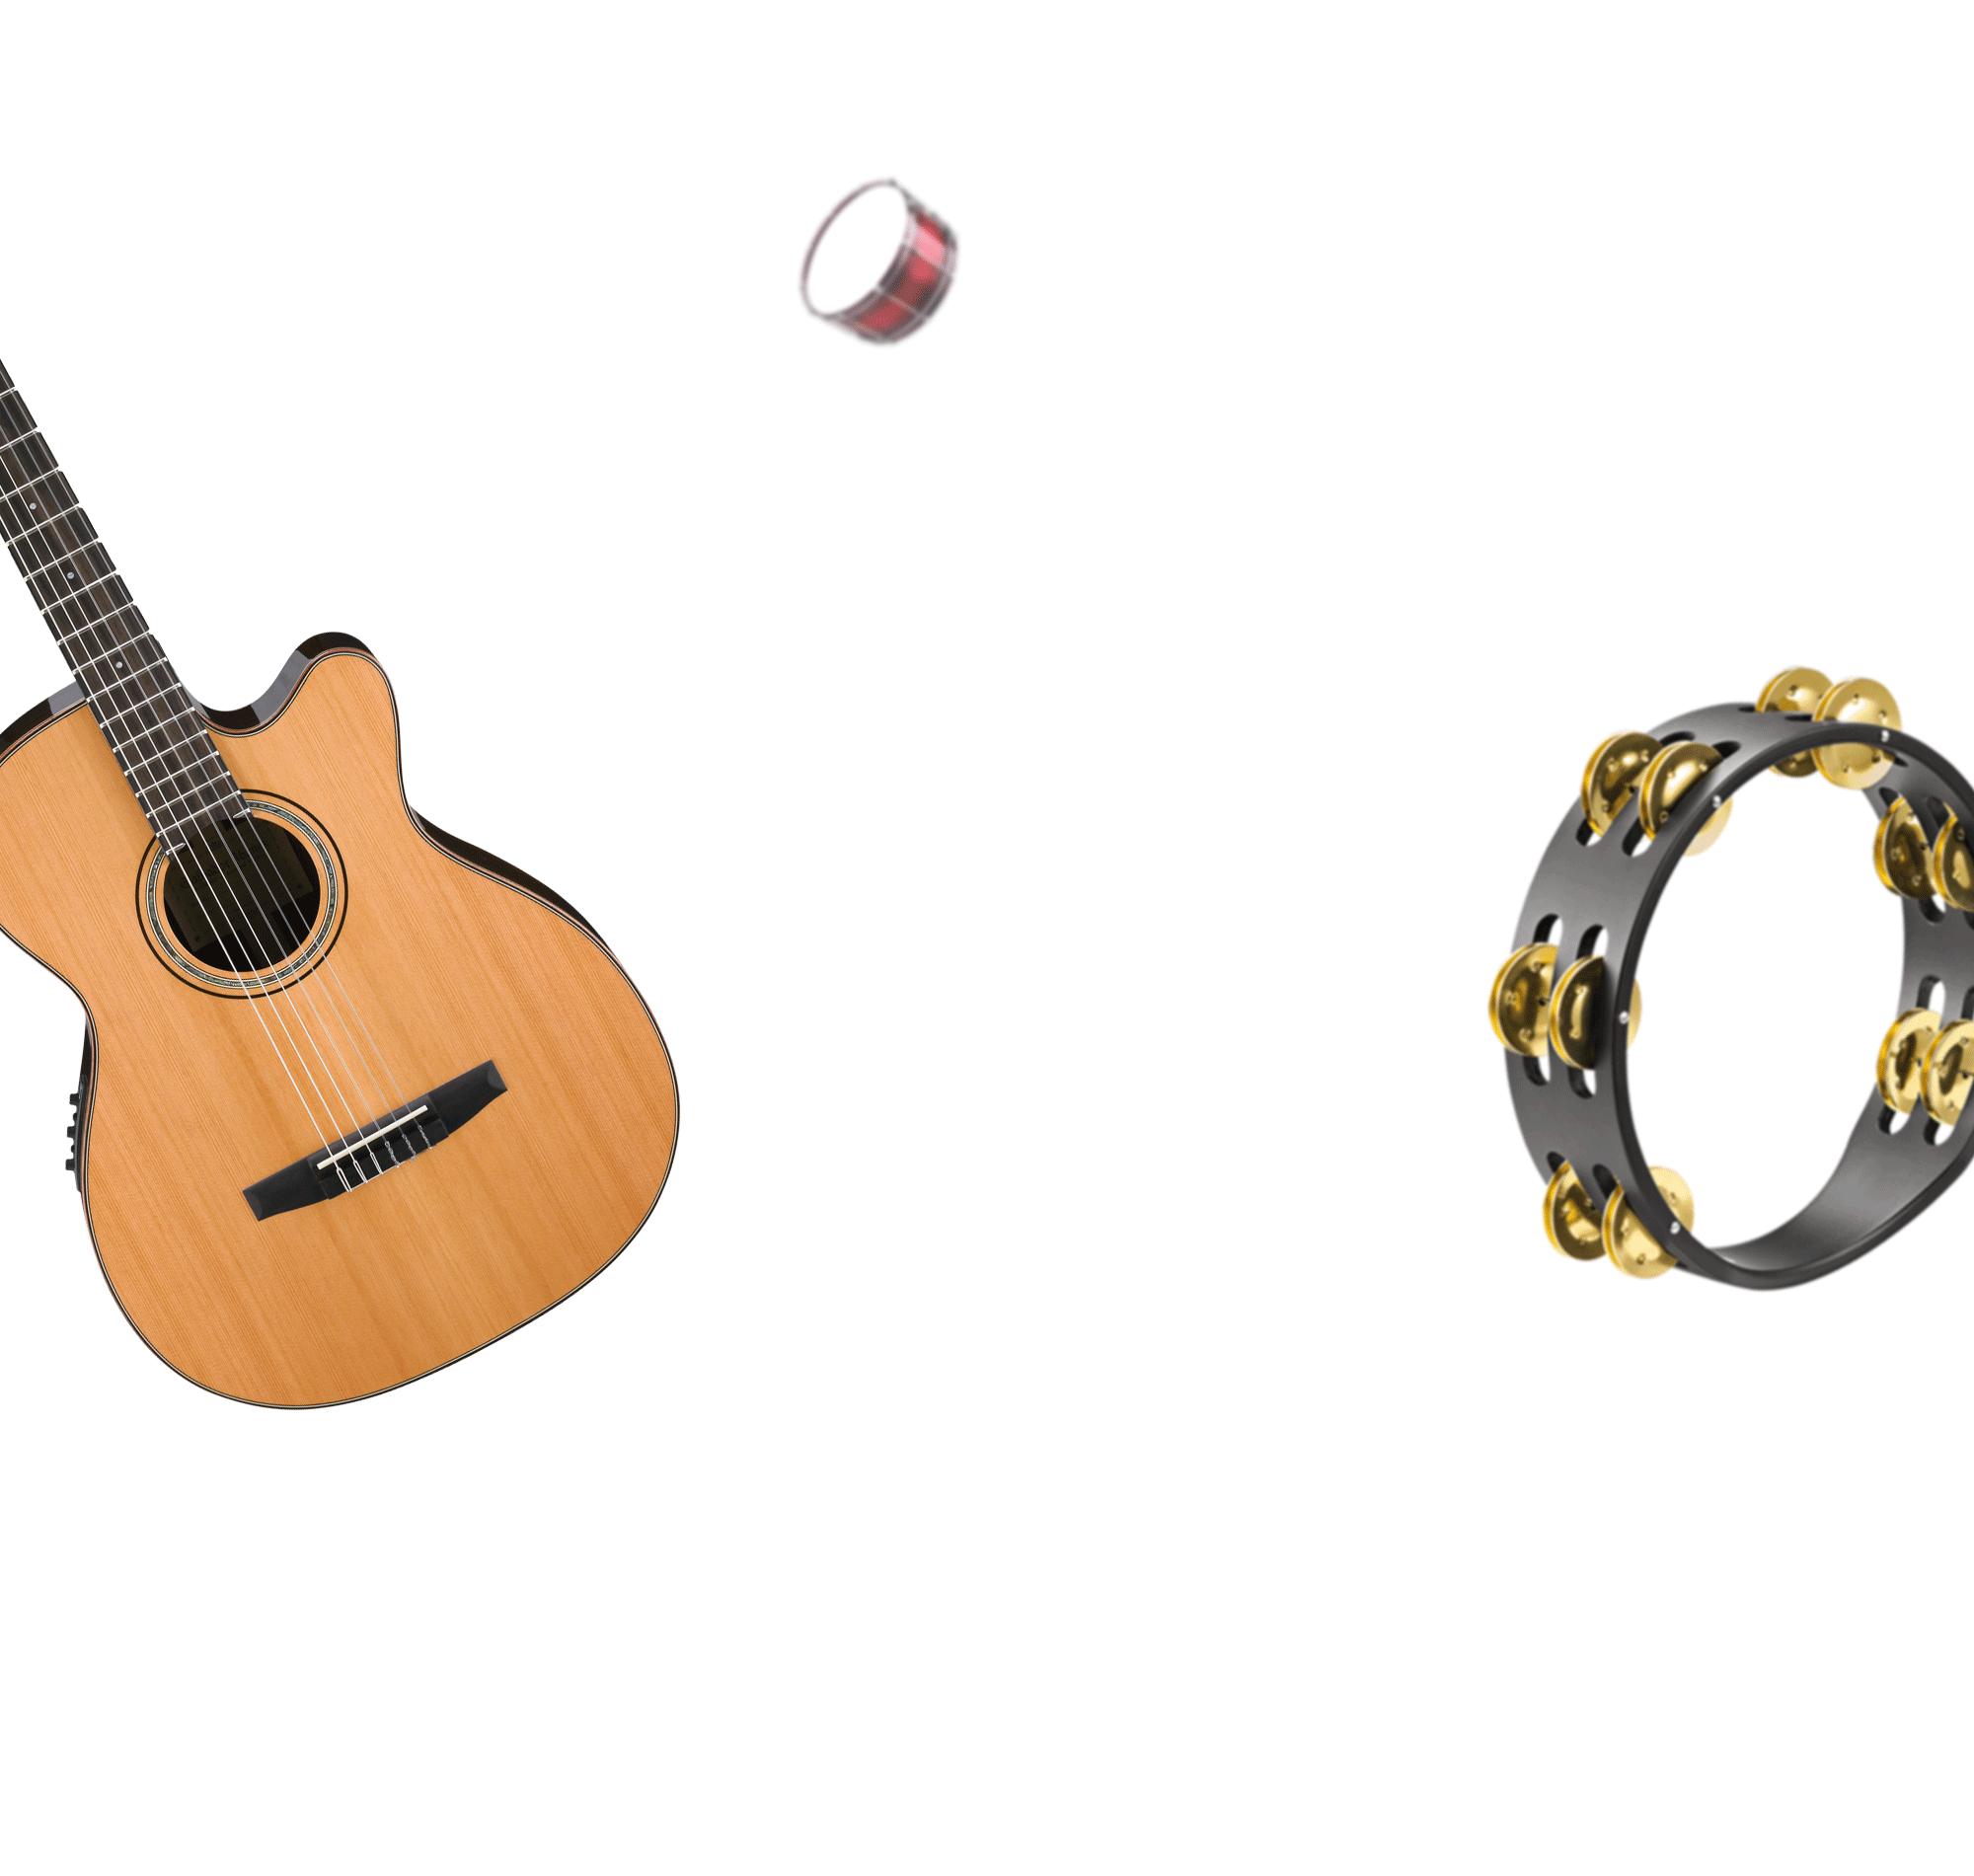 Clipart guitar laud. Autism and music awareness